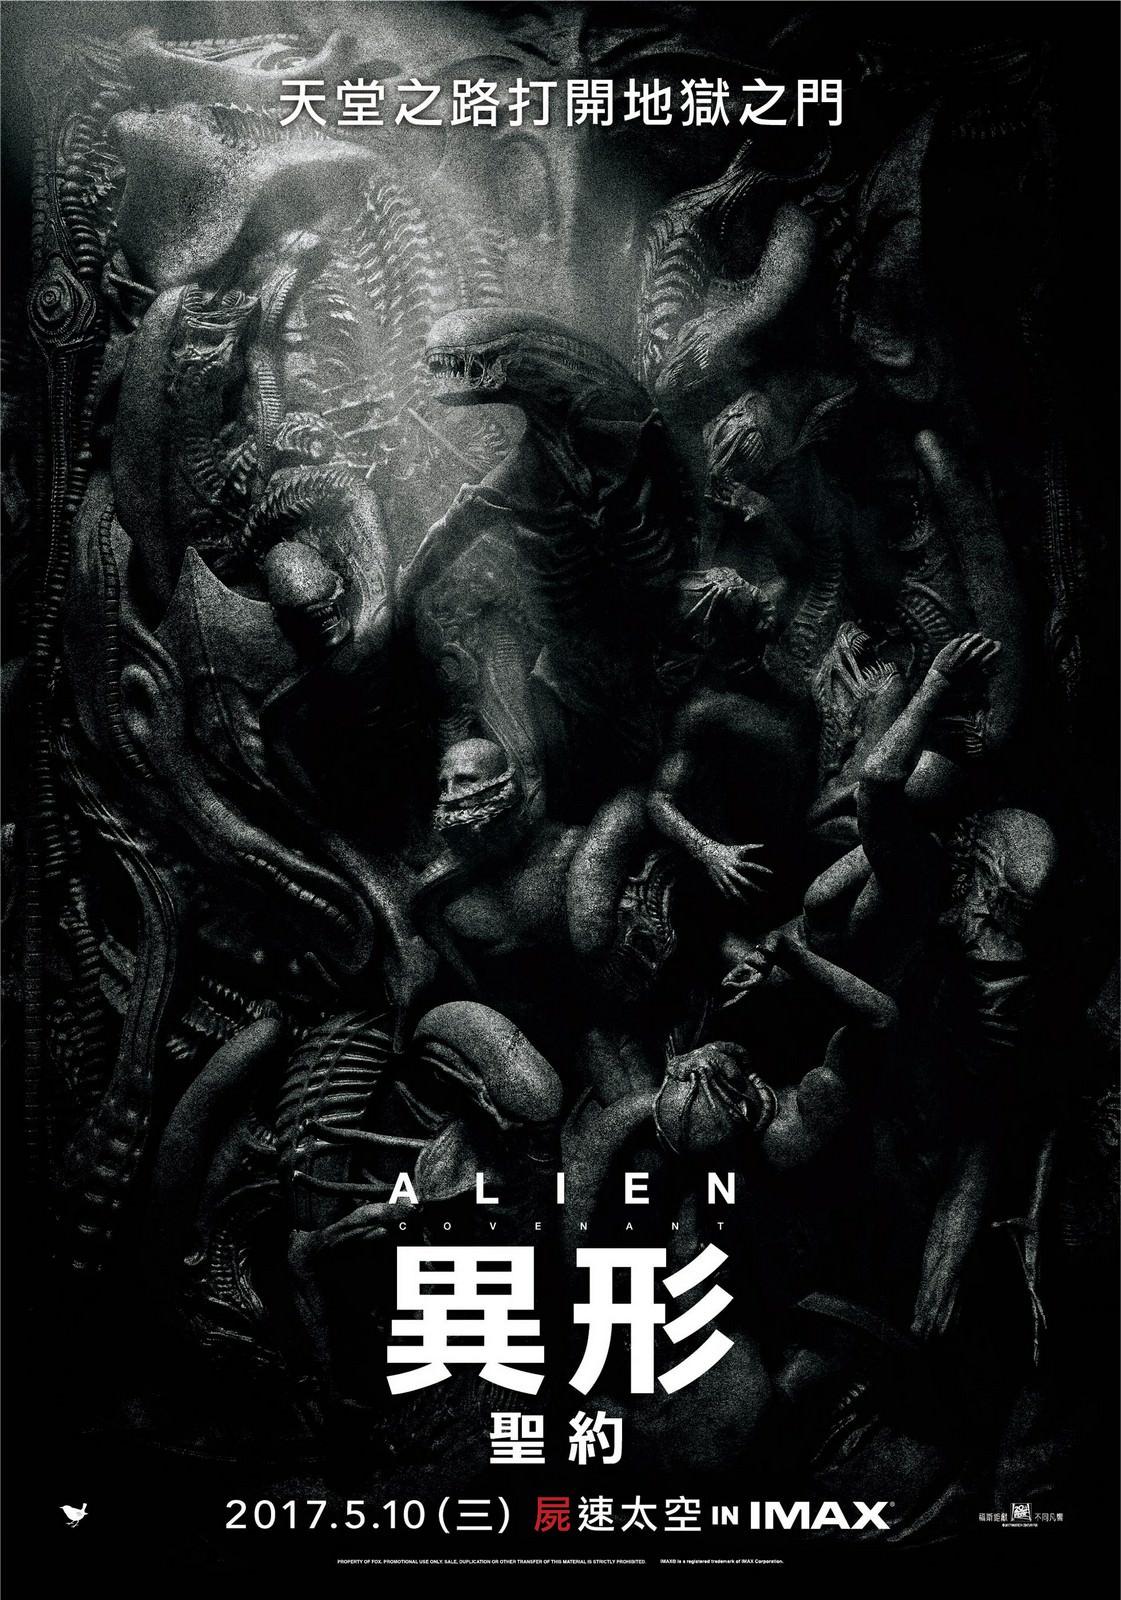 Movie, Alien: Covenant(美國, 2017年) / 異形:聖約(台灣.香港) / 异形:契约(中國), 電影海報, 台灣